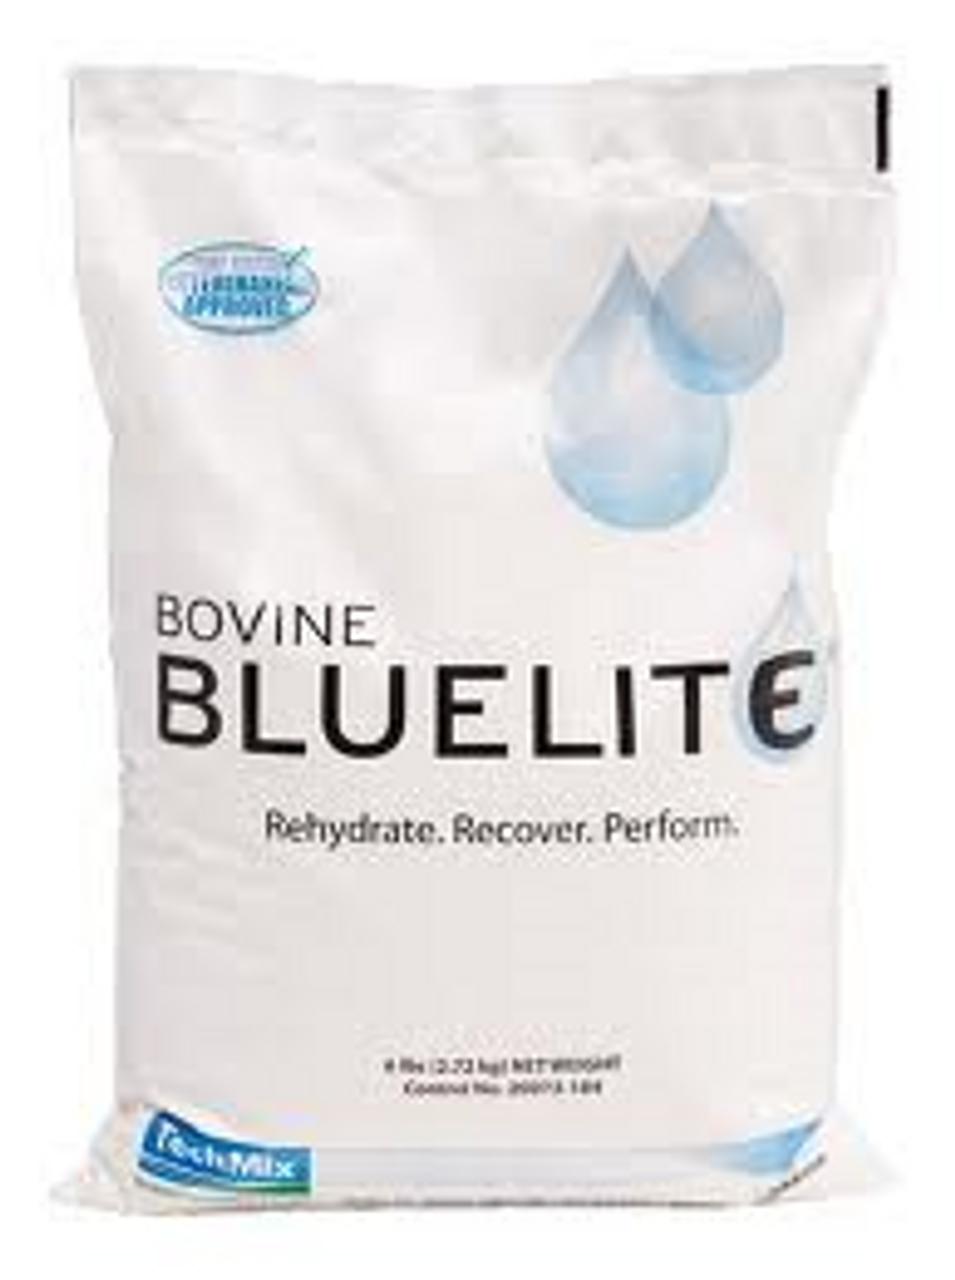 Bovine Bluelite